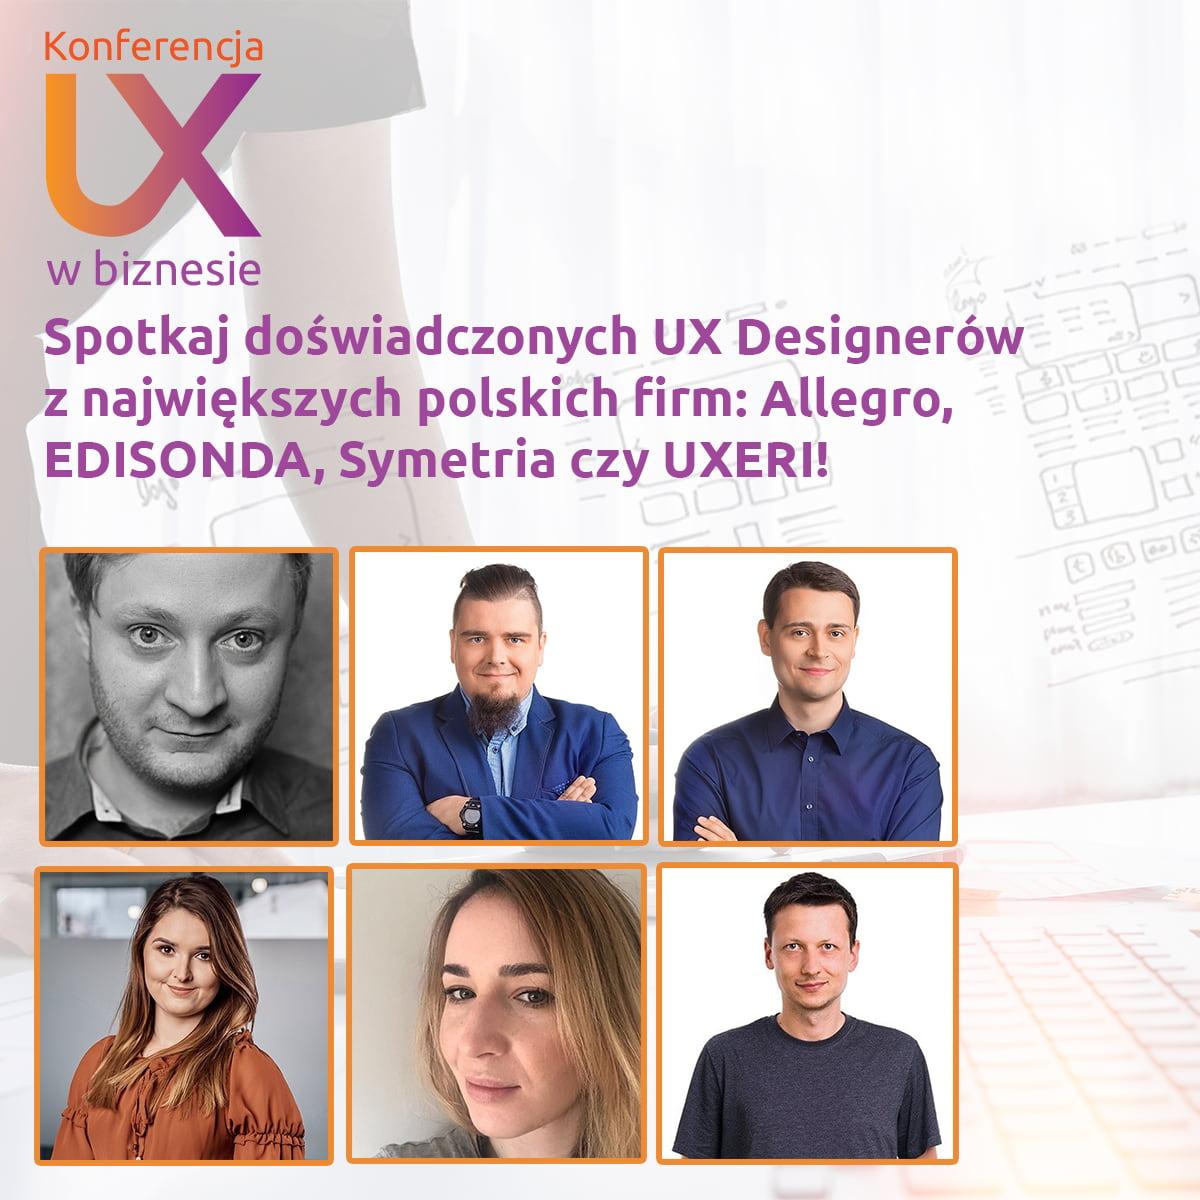 Prelegenci Konferencji UX w biznesie